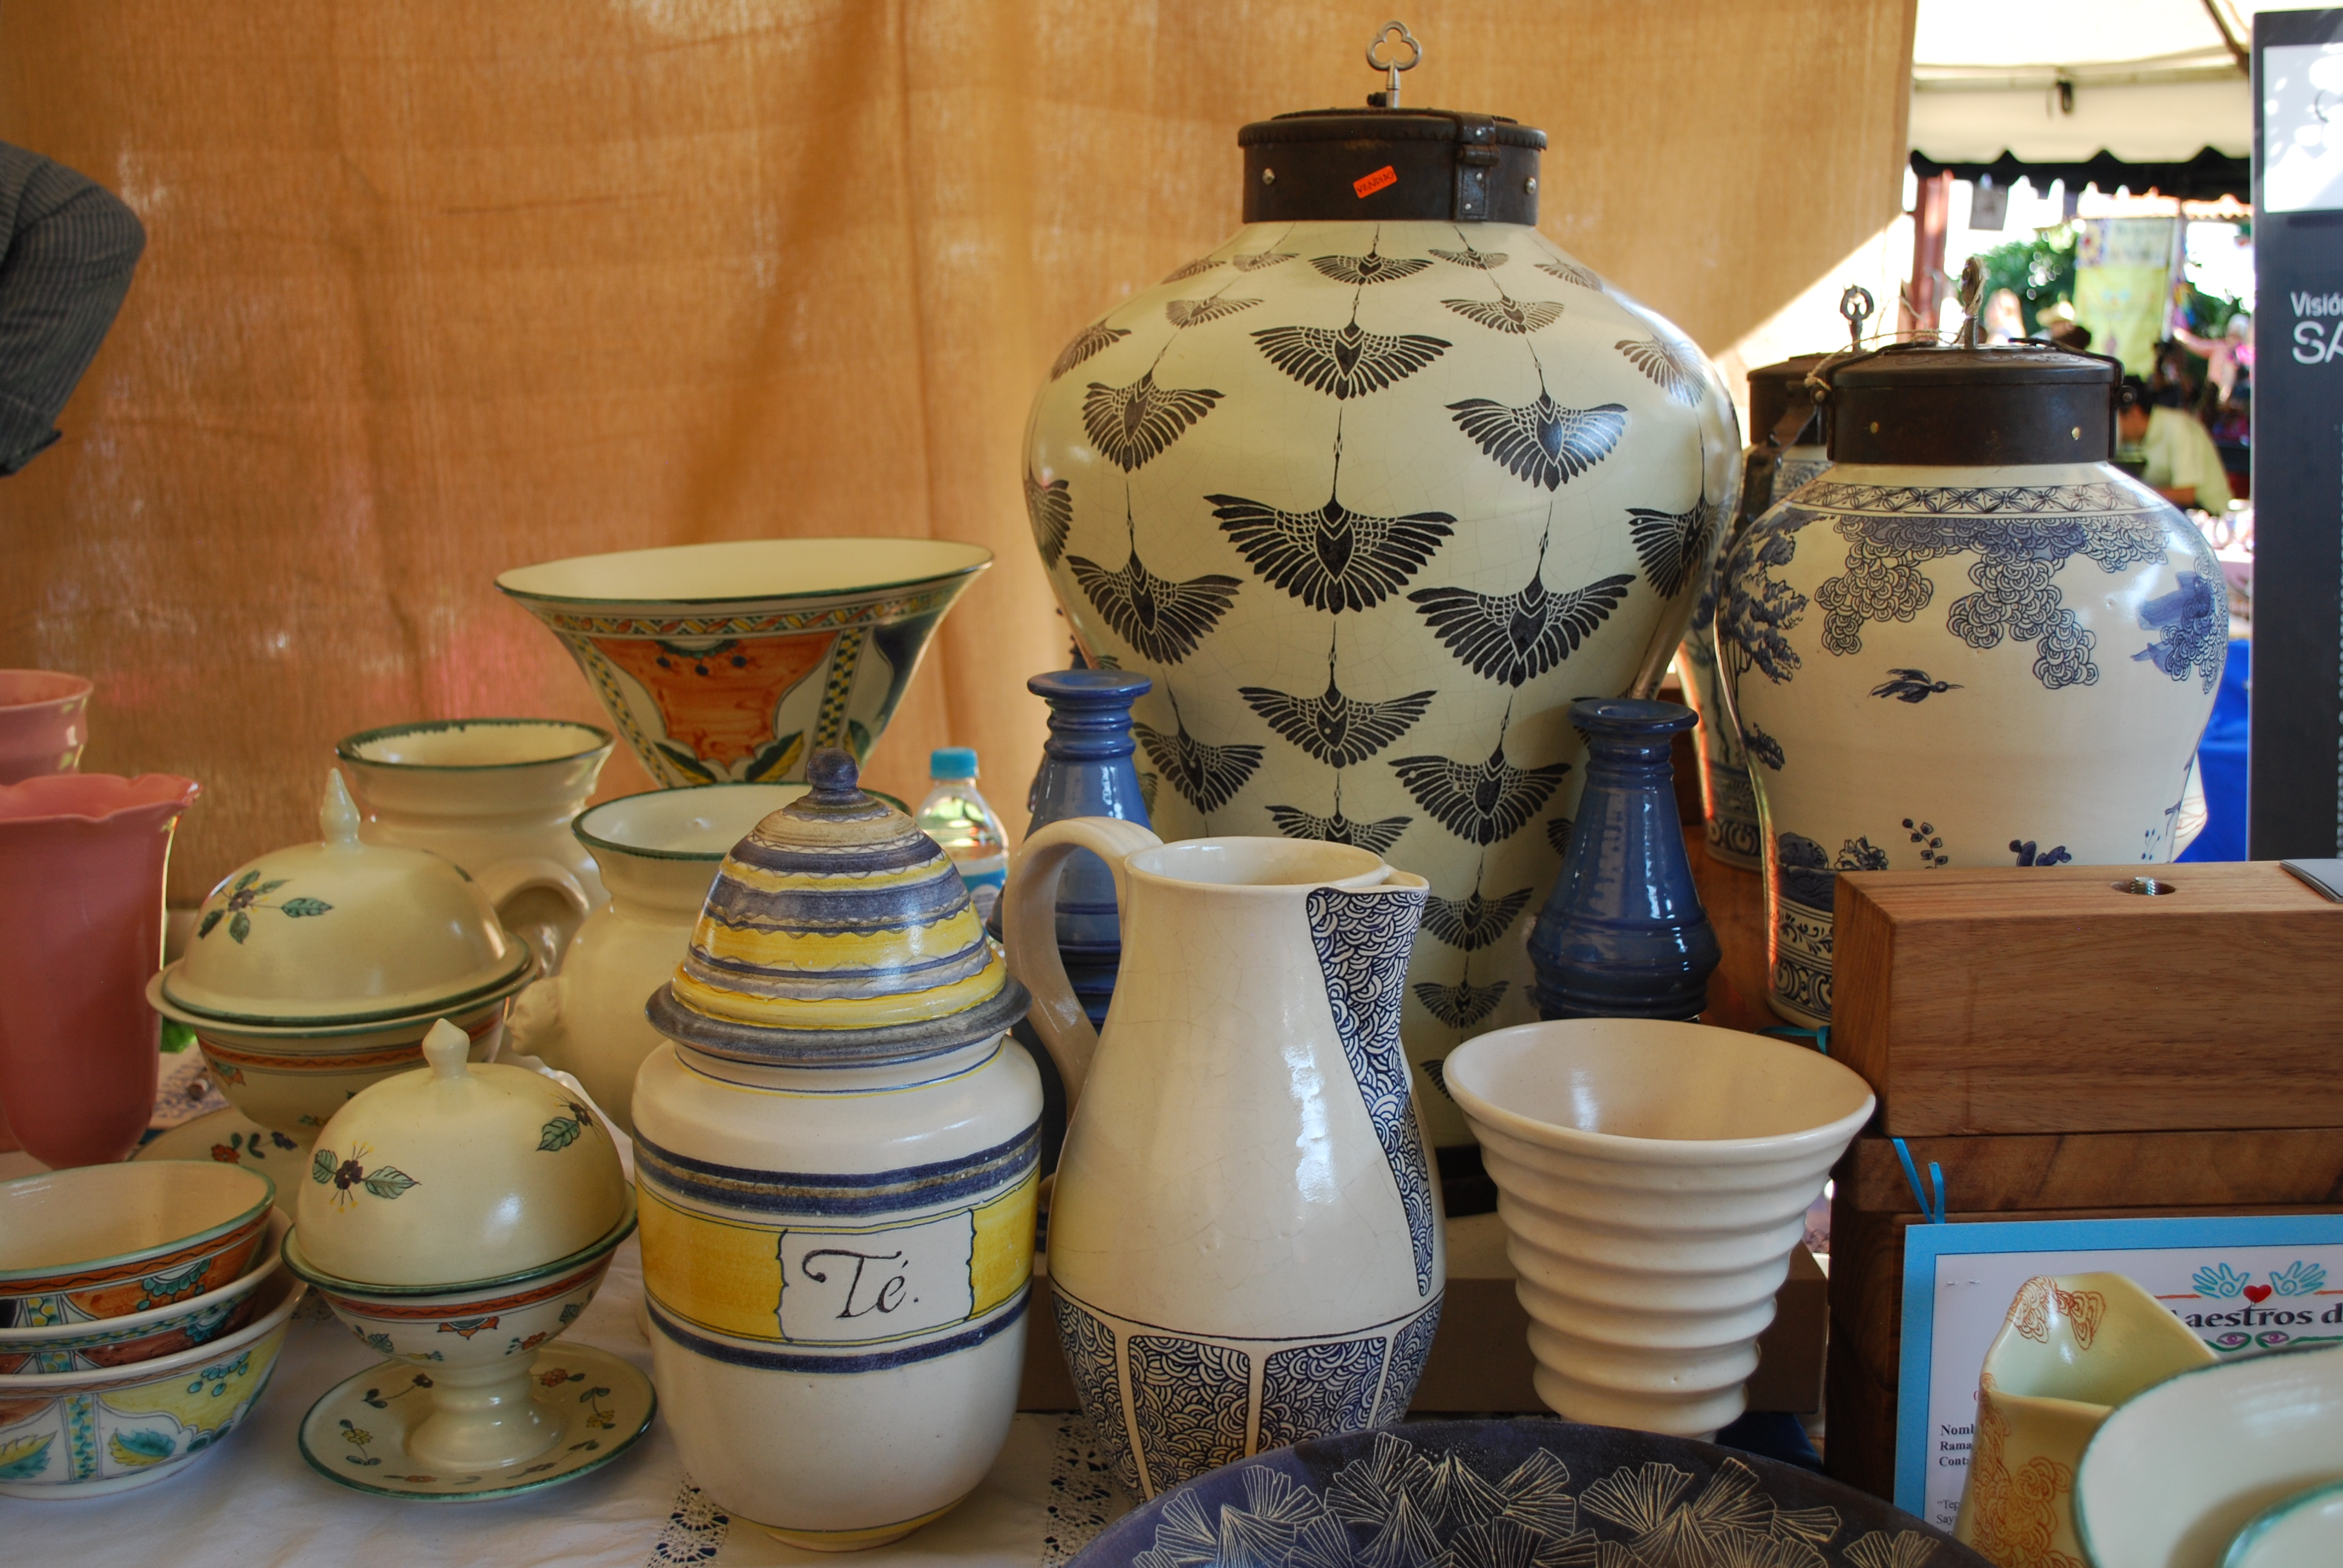 cerámica mayólica